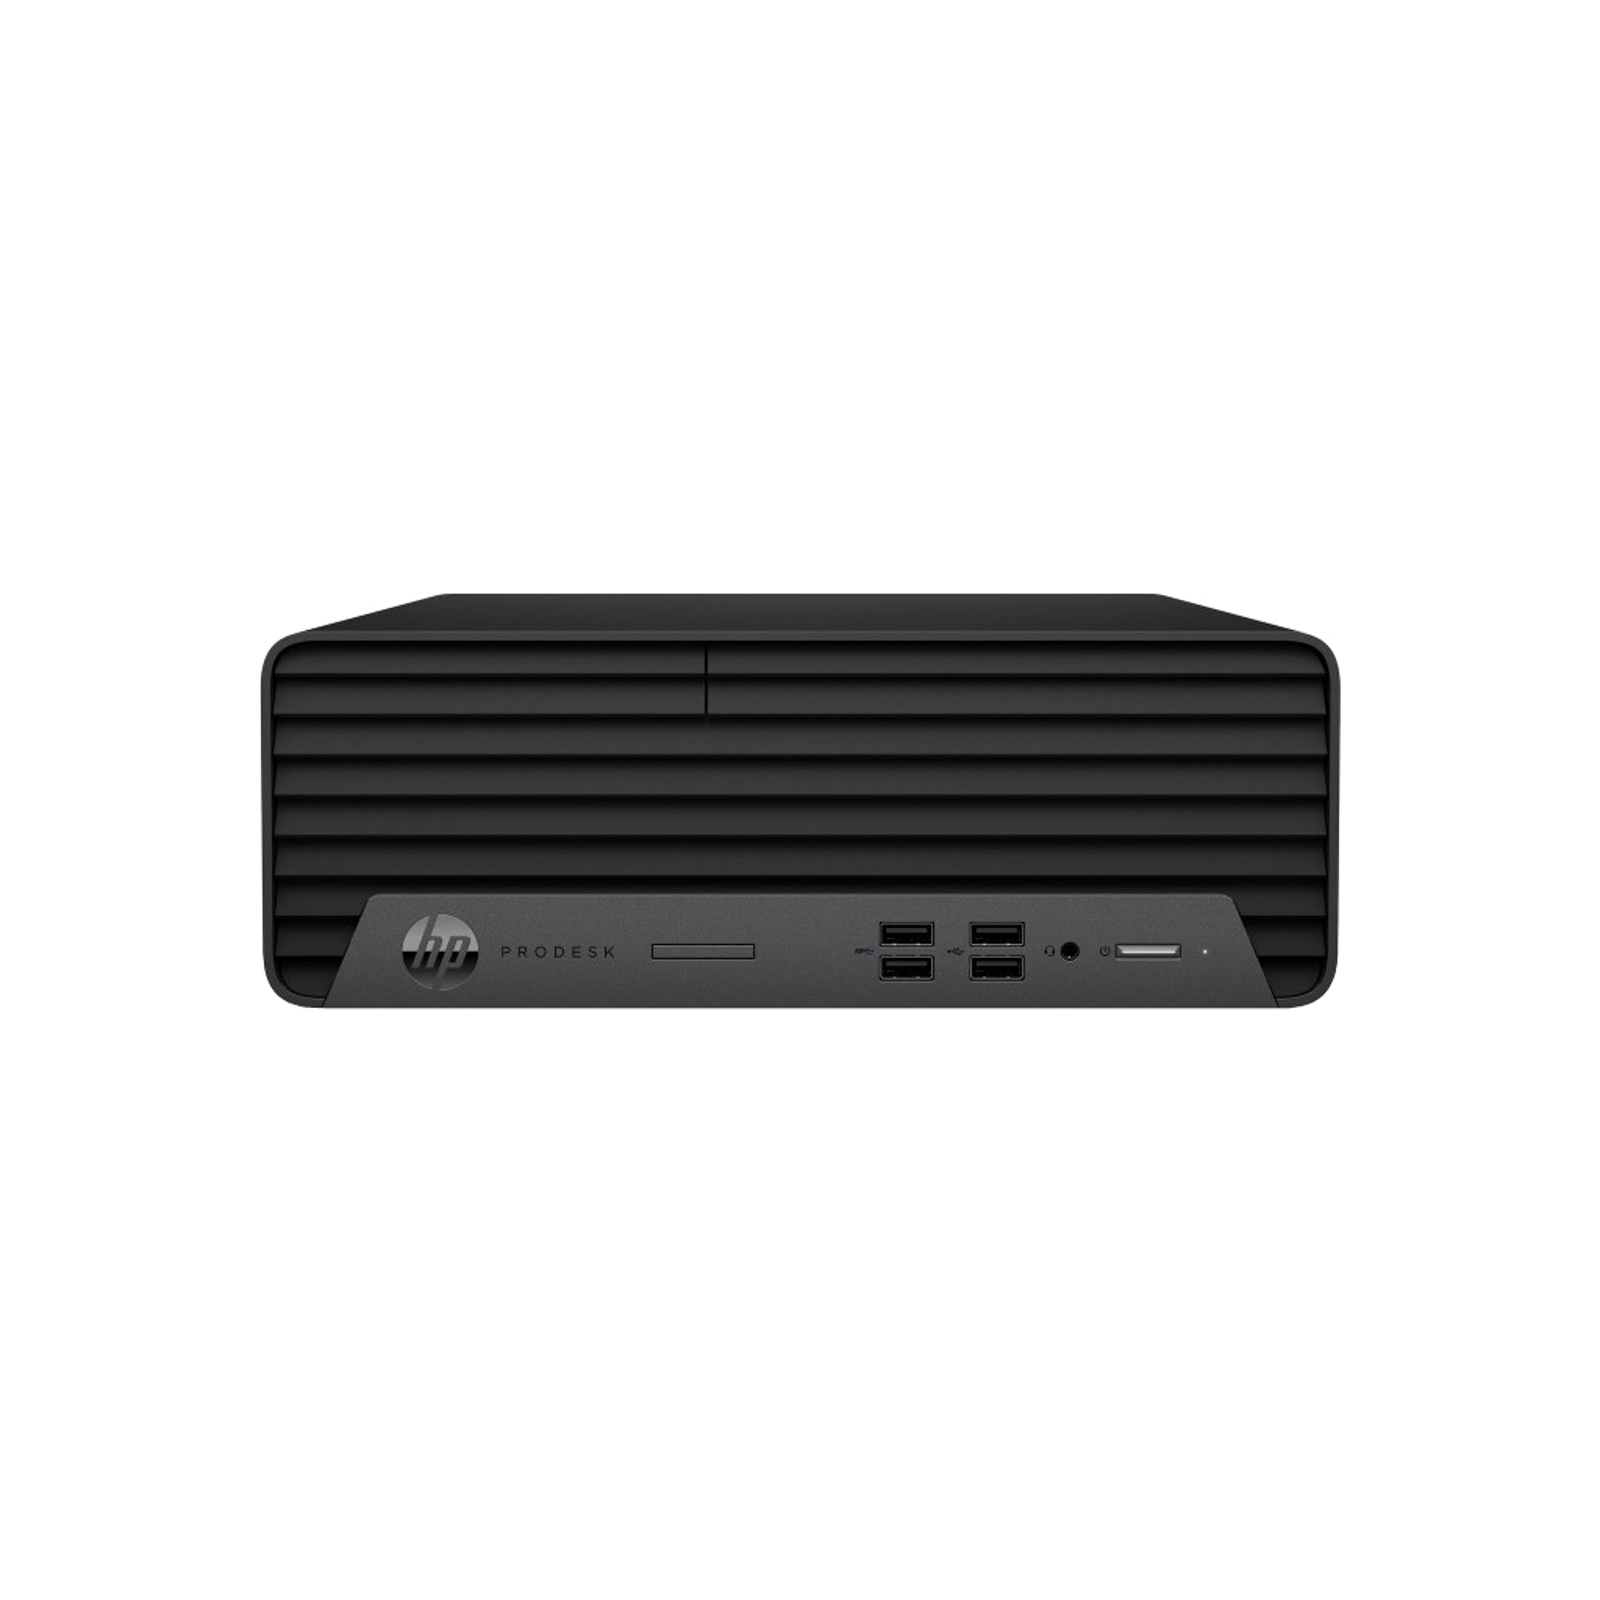 Компьютер HP ProDesk 400 G7 SFF / i3-10100 (293Z3EA) изображение 2